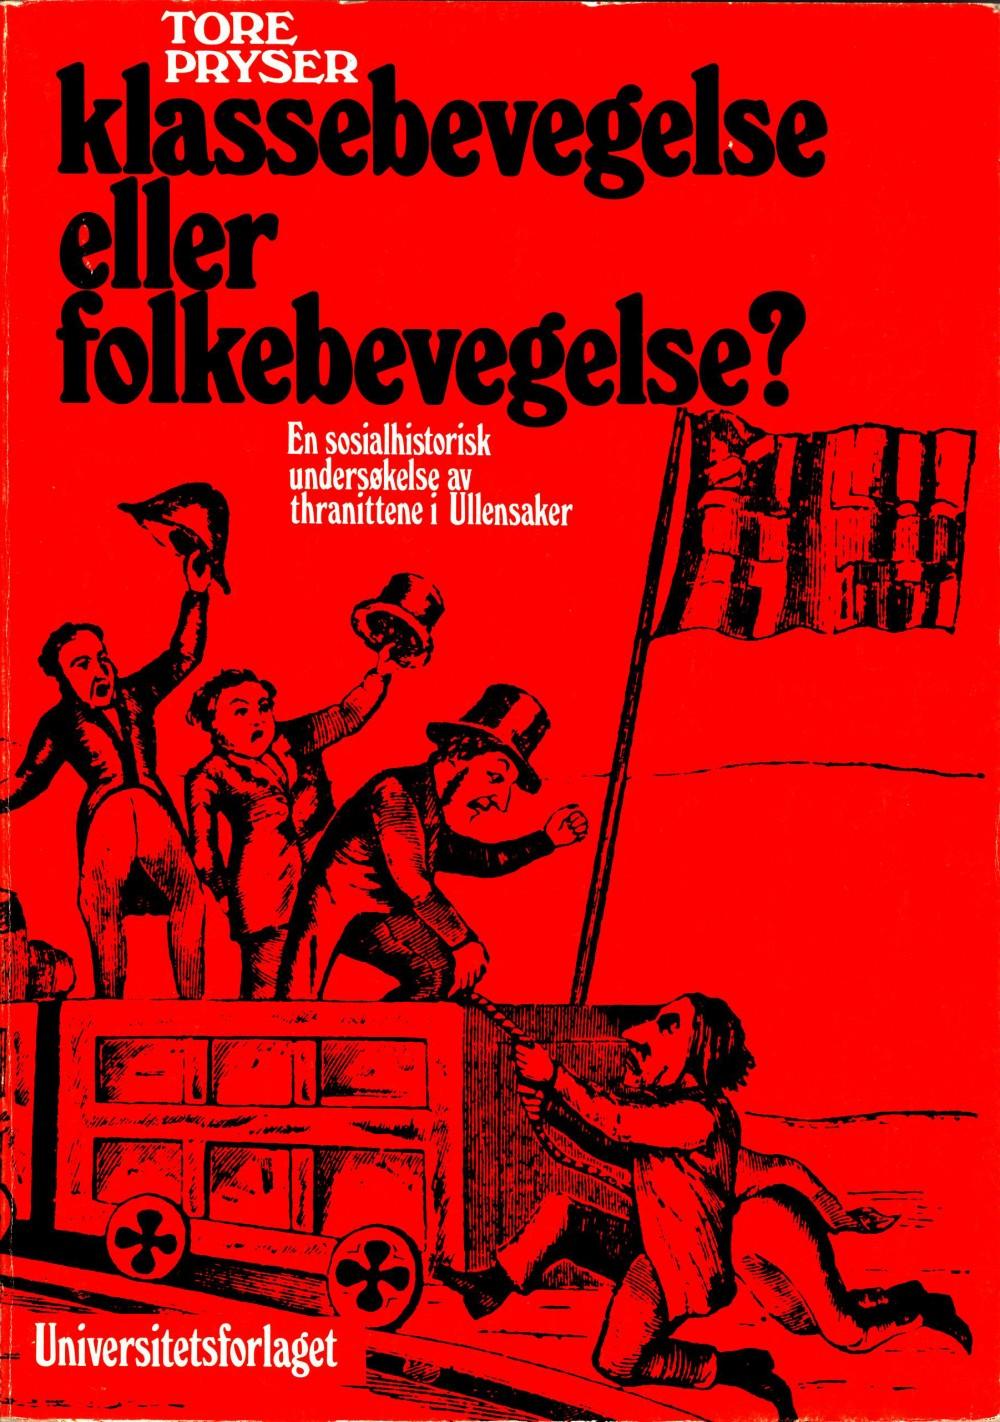 Tore Pryser: Klassebevegelse eller folkebevegelse?